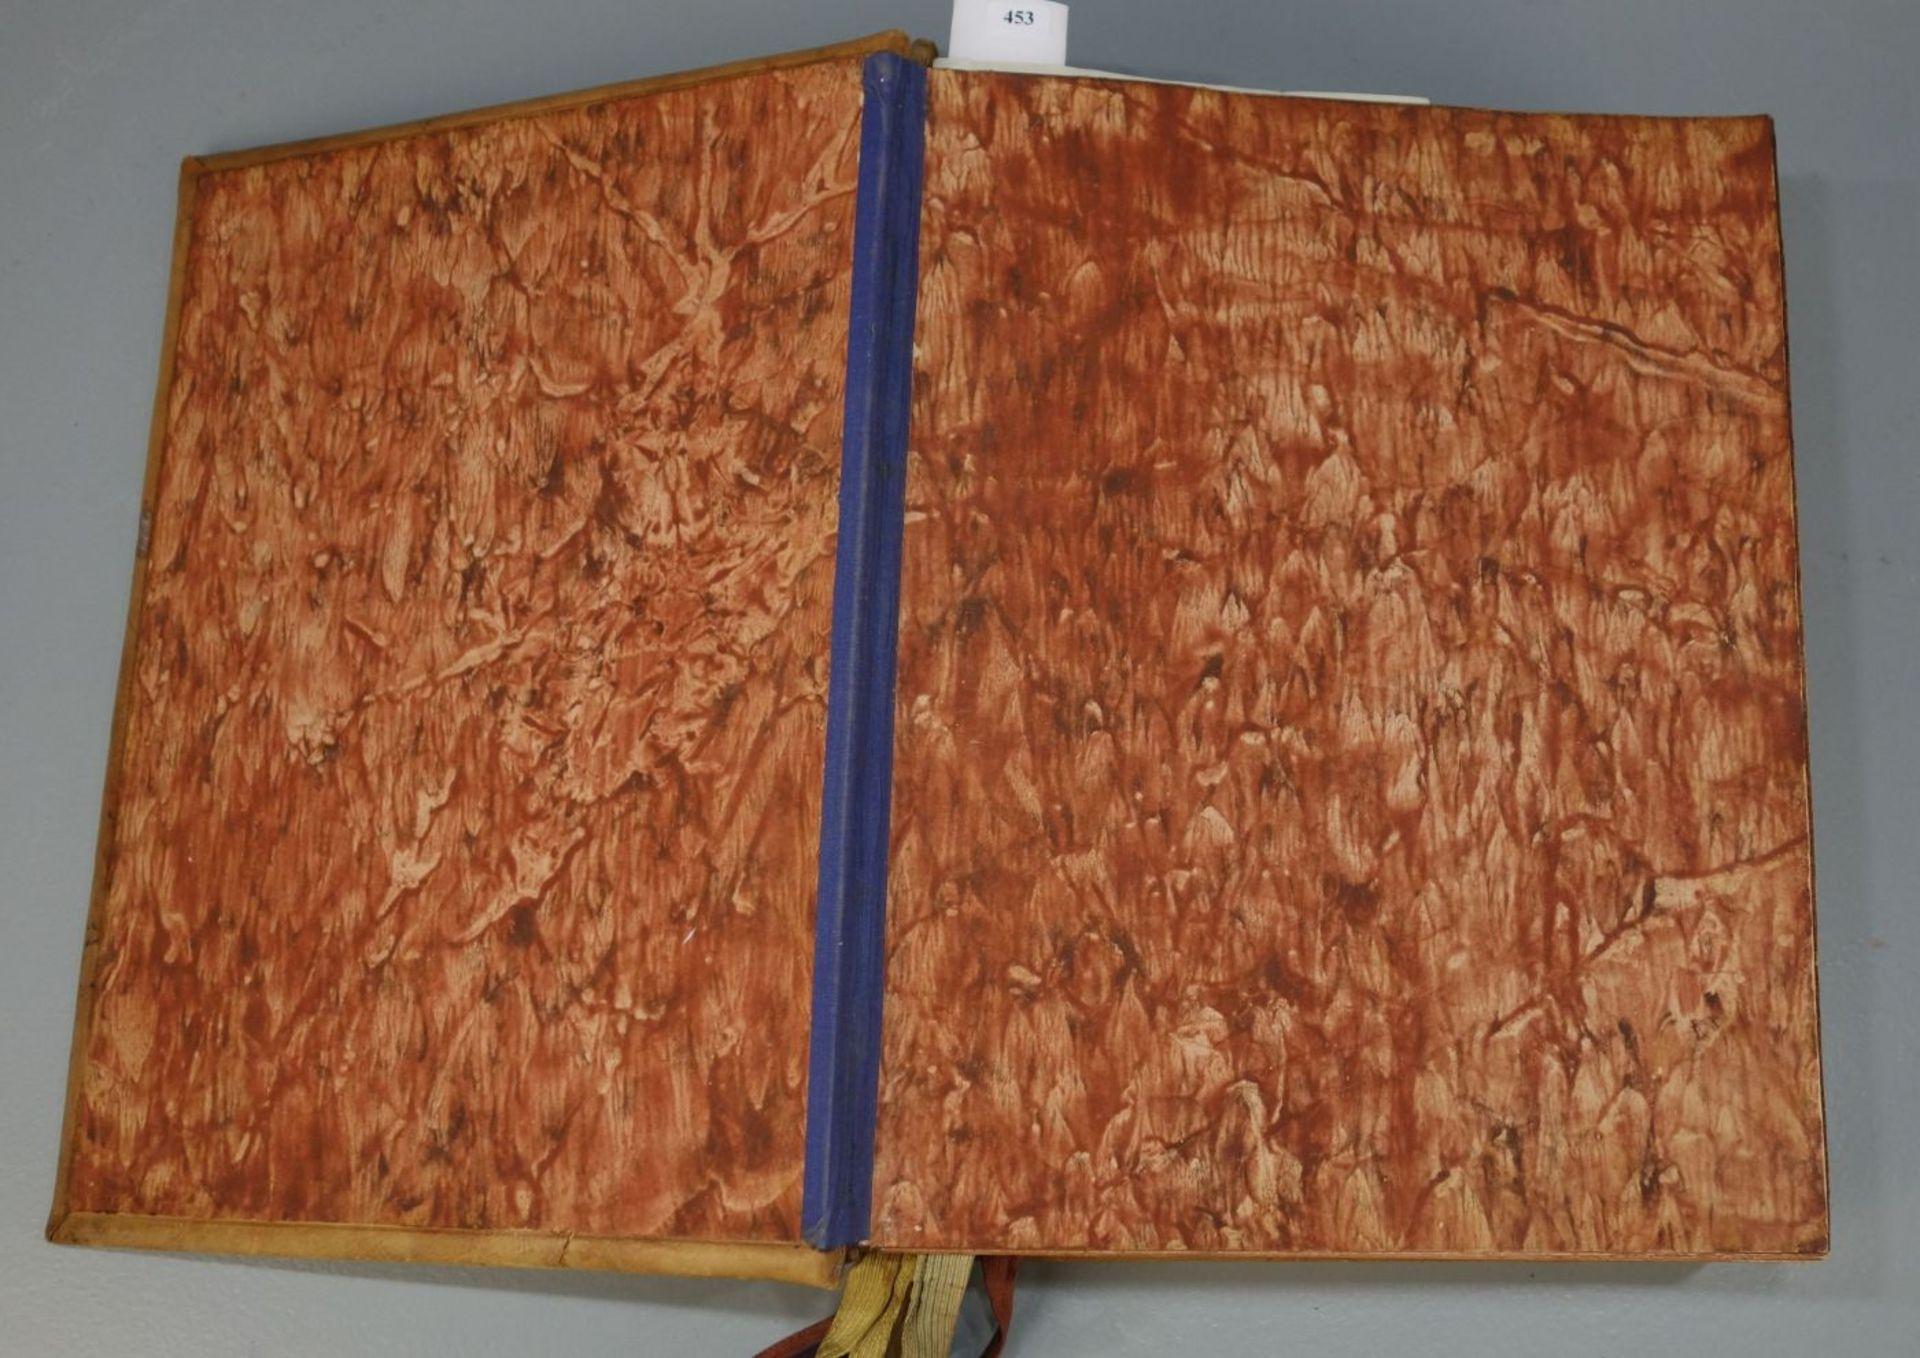 BIBEL IM LEDEREINBAND - Image 3 of 8